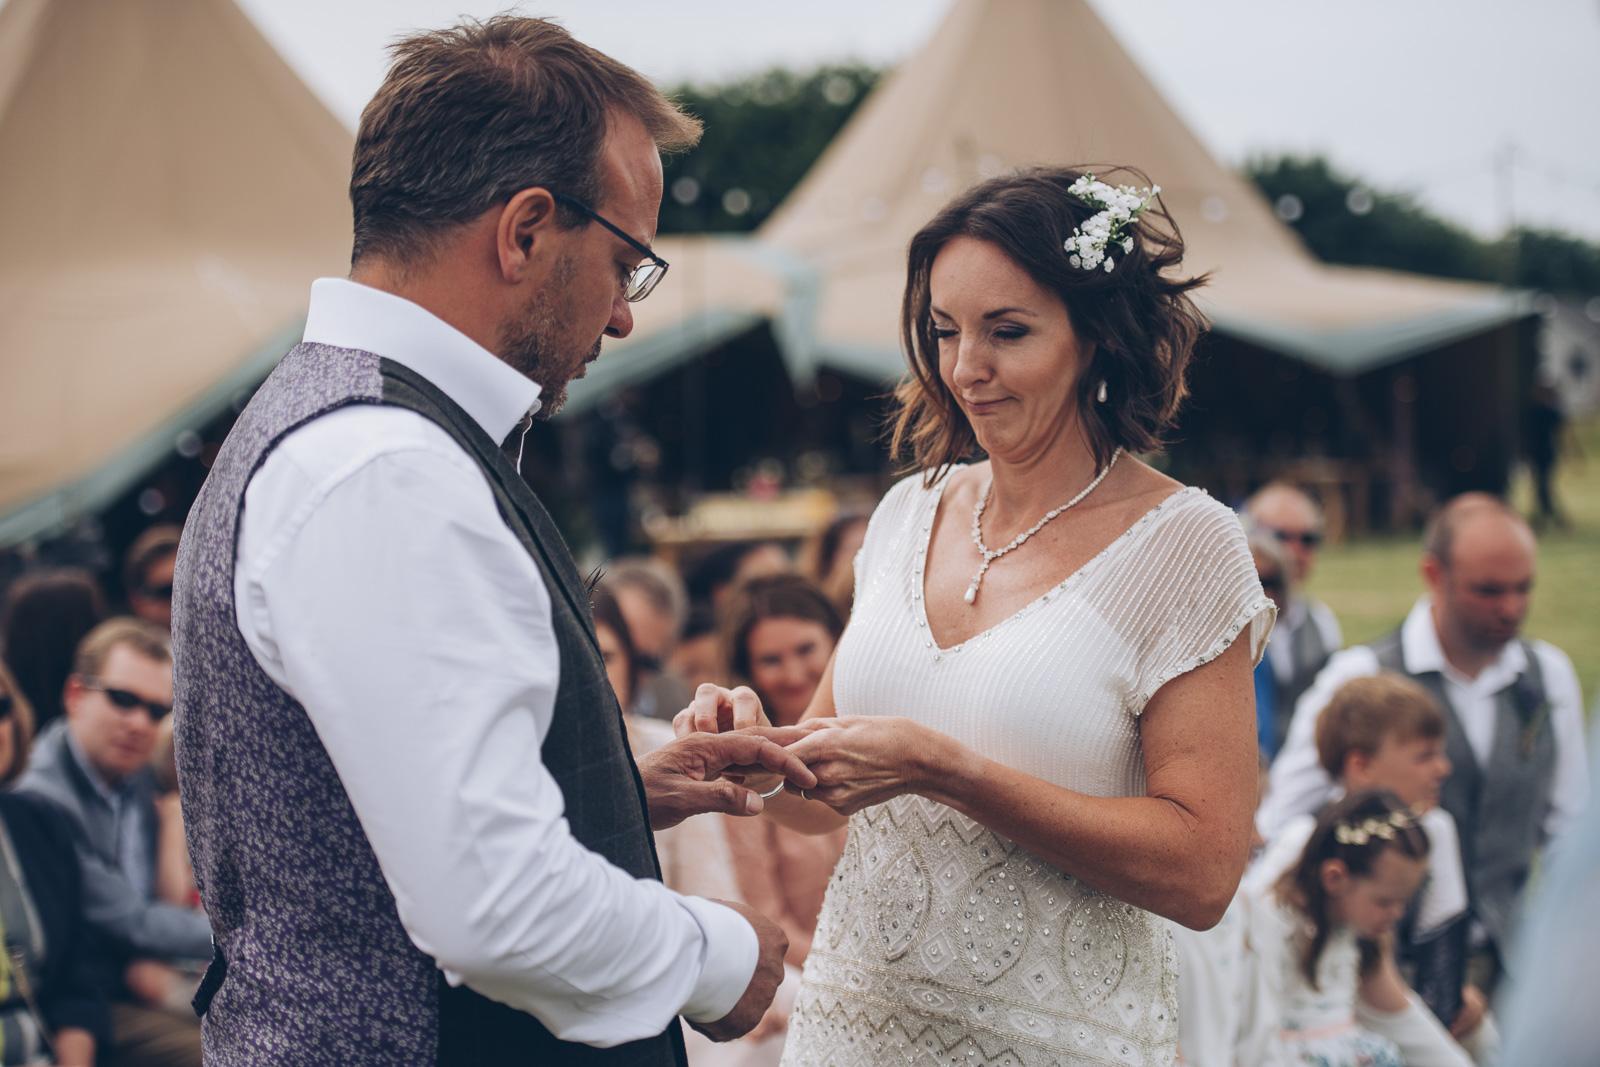 026 Wedding Photographer Hitchin © Erica Hawkins Photography